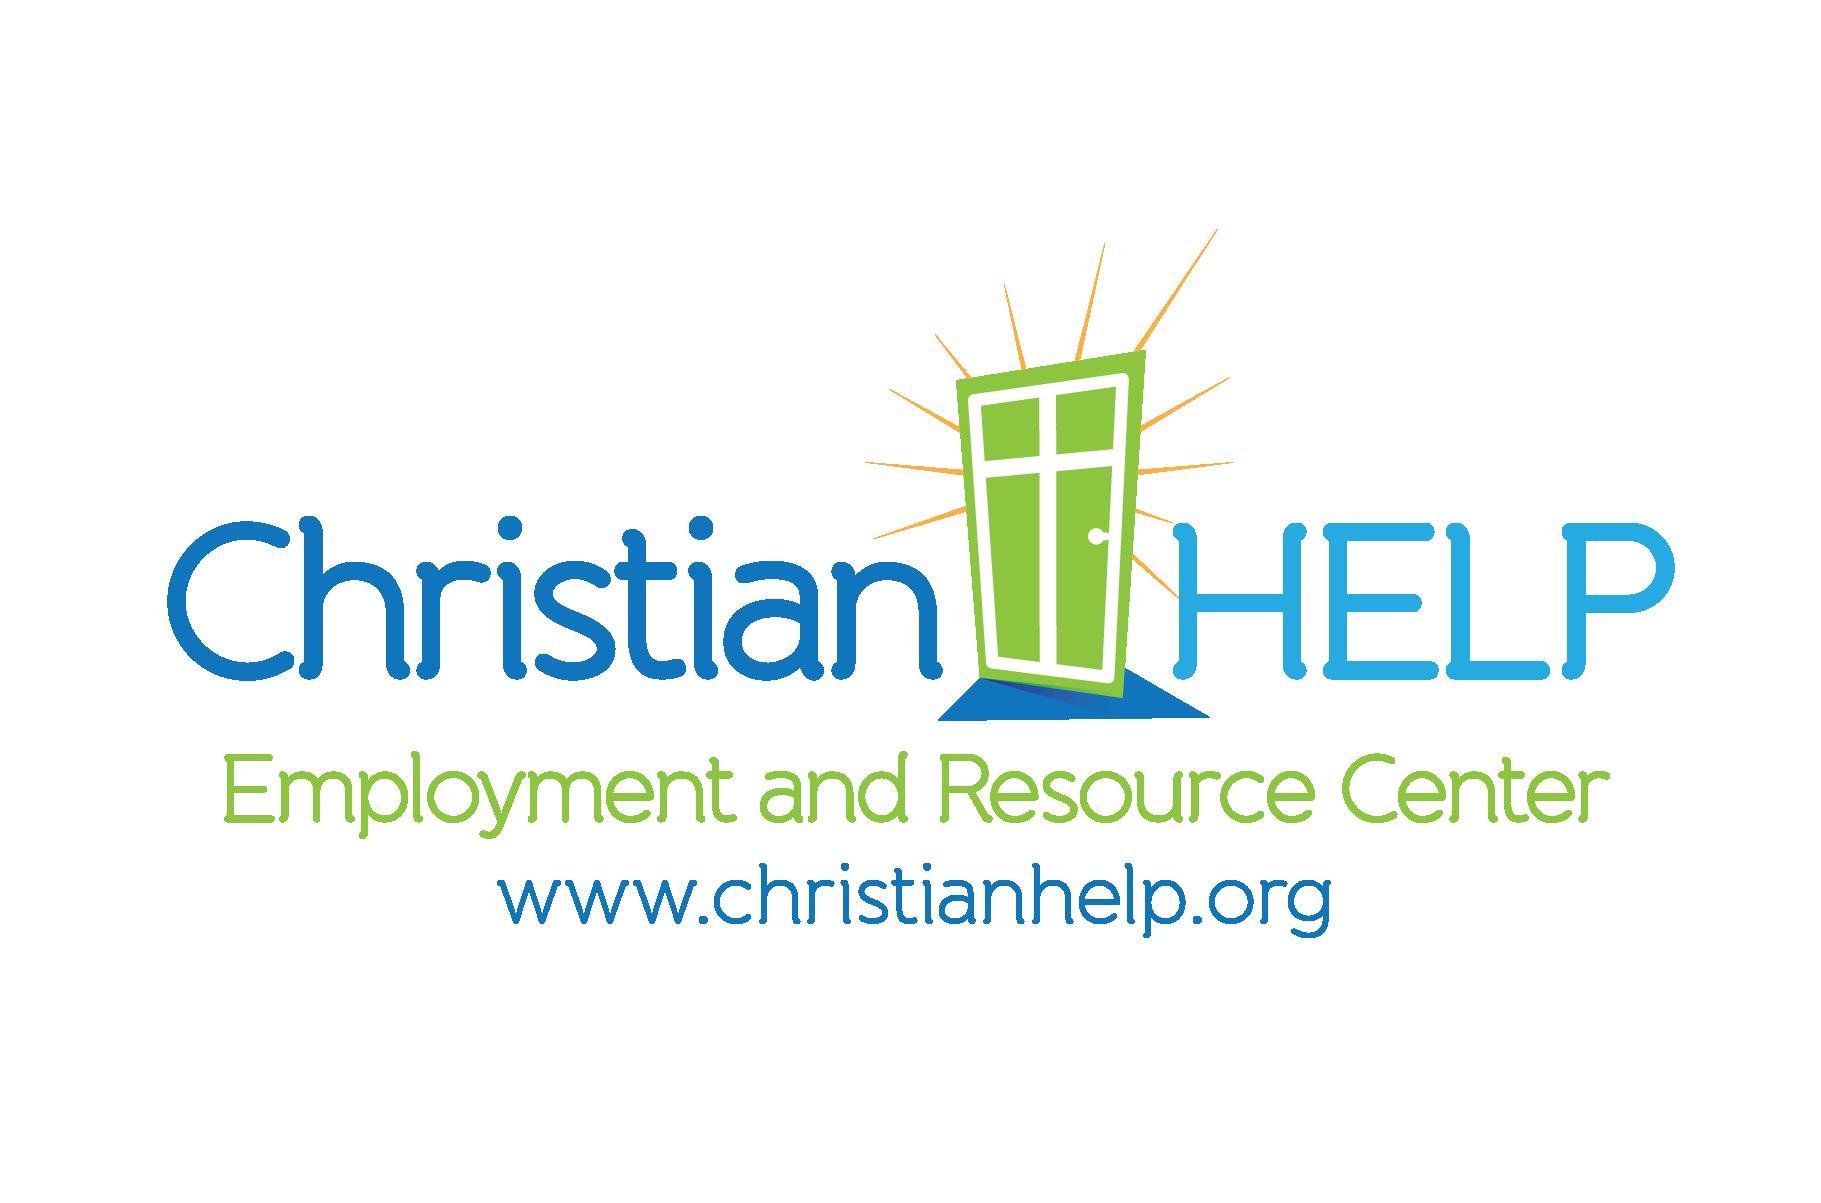 Christian Help